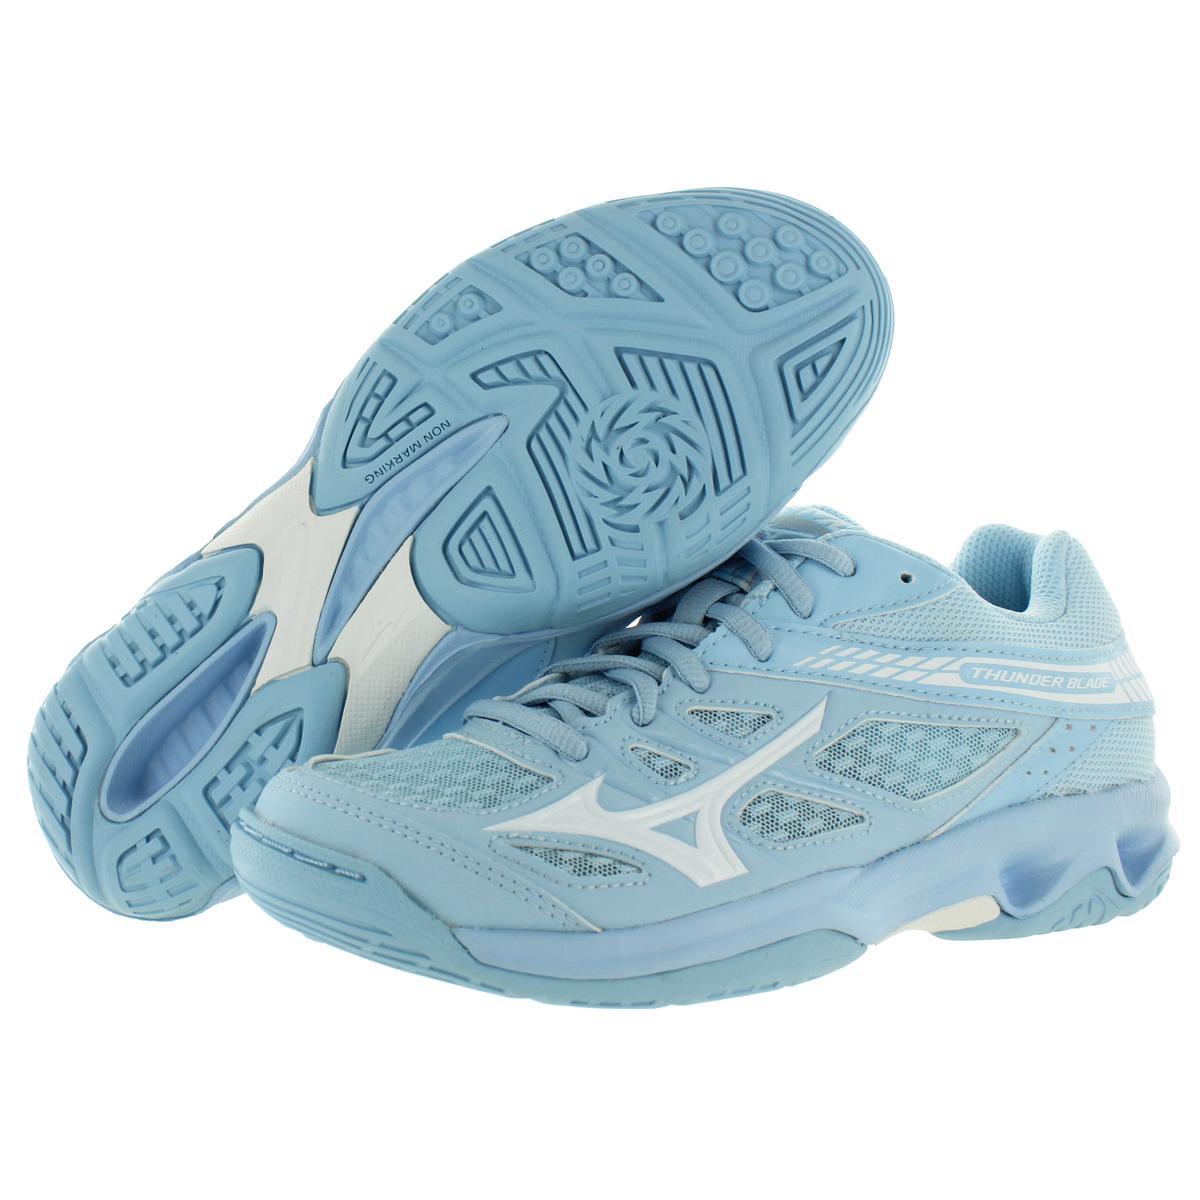 Mizuno-Womens-Thunder-Blade-Low-Top-Non-Marking-Sneakers-Shoes-BHFO-9051 thumbnail 4